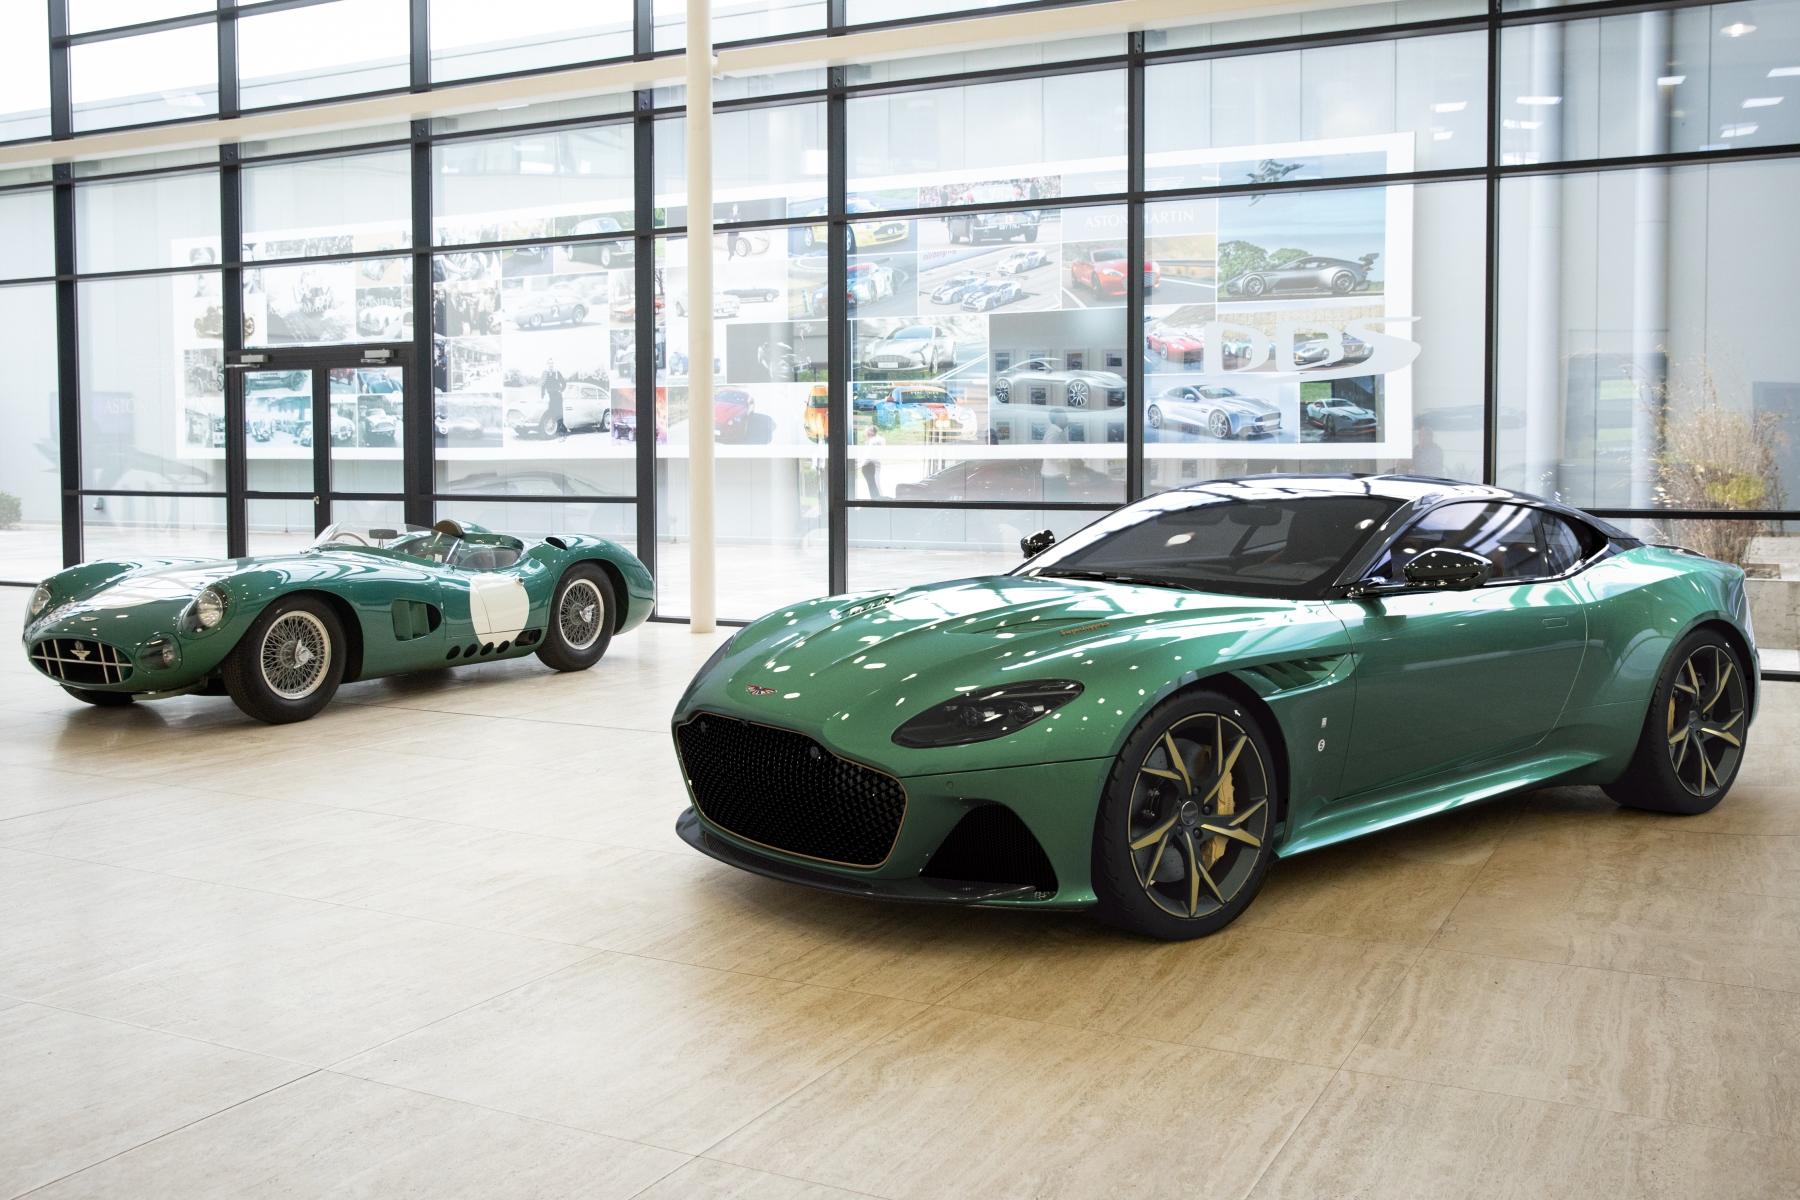 Limited edition Aston Martin DBS 59 celebrates historic DBR1 Le Mans win